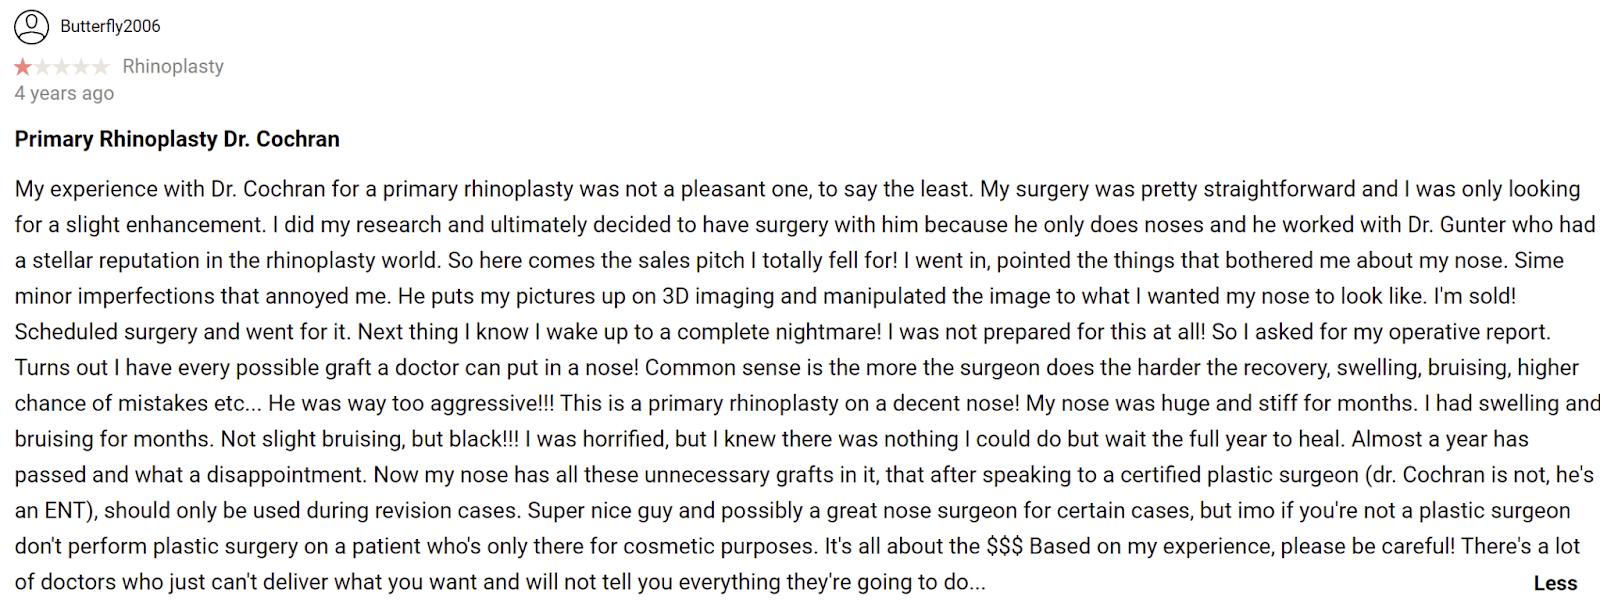 Dallas Rhinoplasty Center review